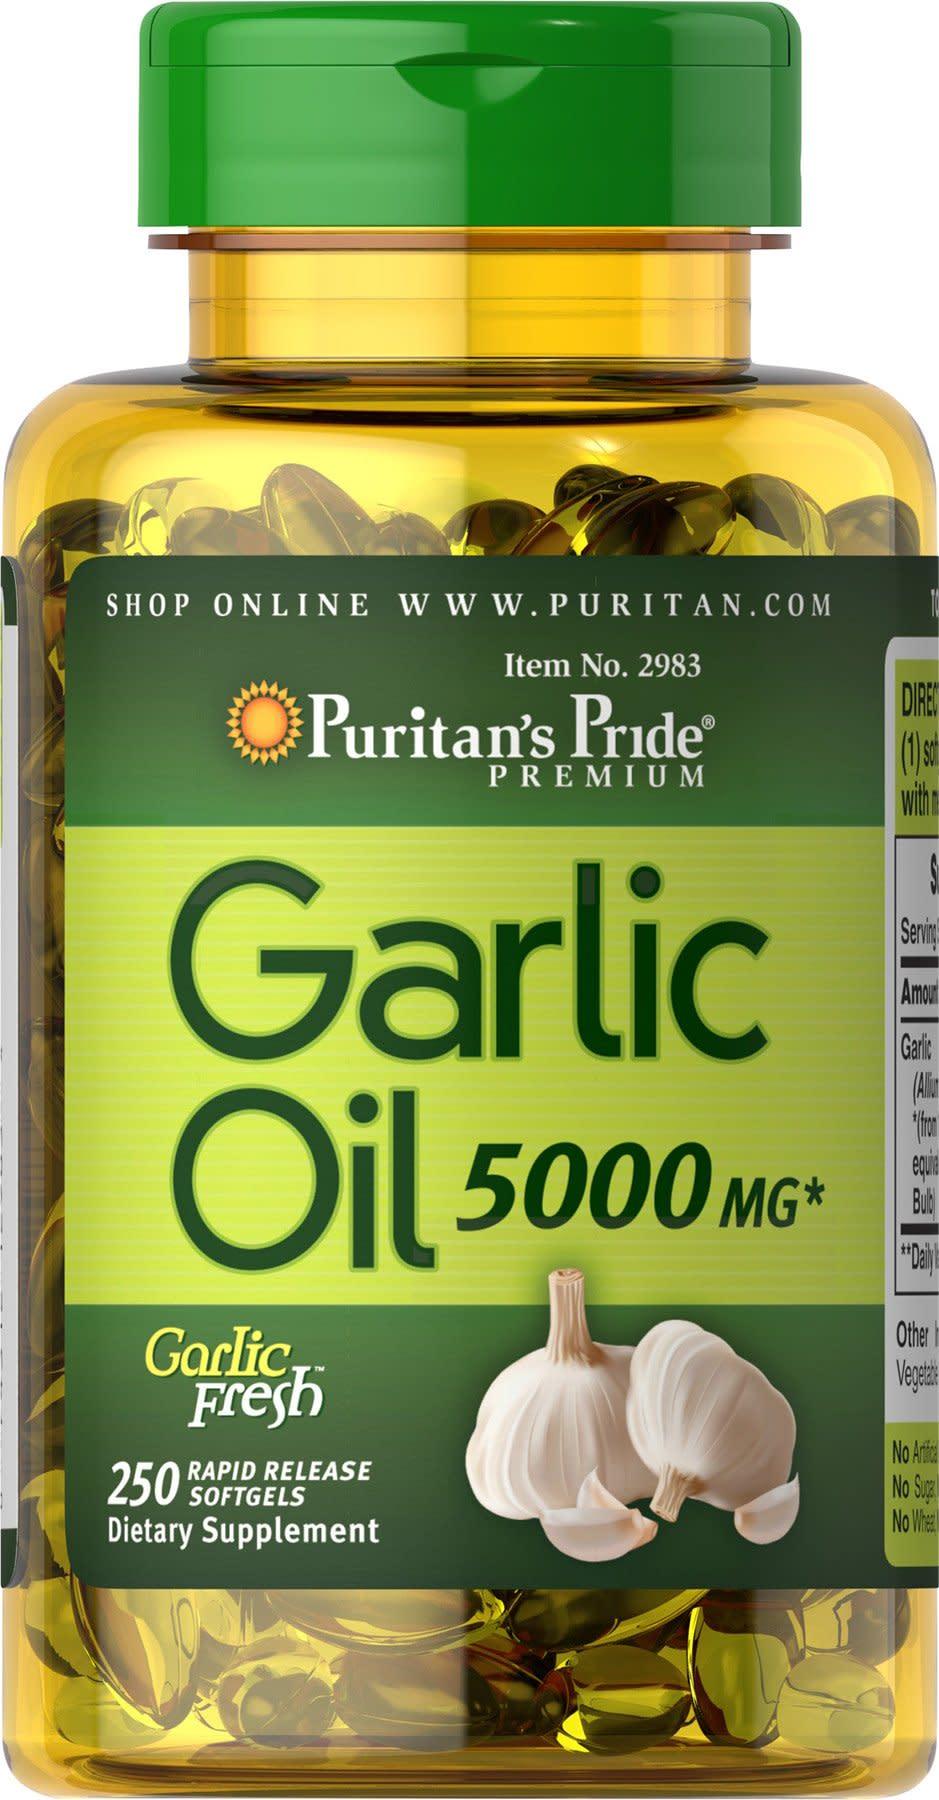 Puritans Pride Garlic Oil 5000 mg-250 Rapid Release Softgels